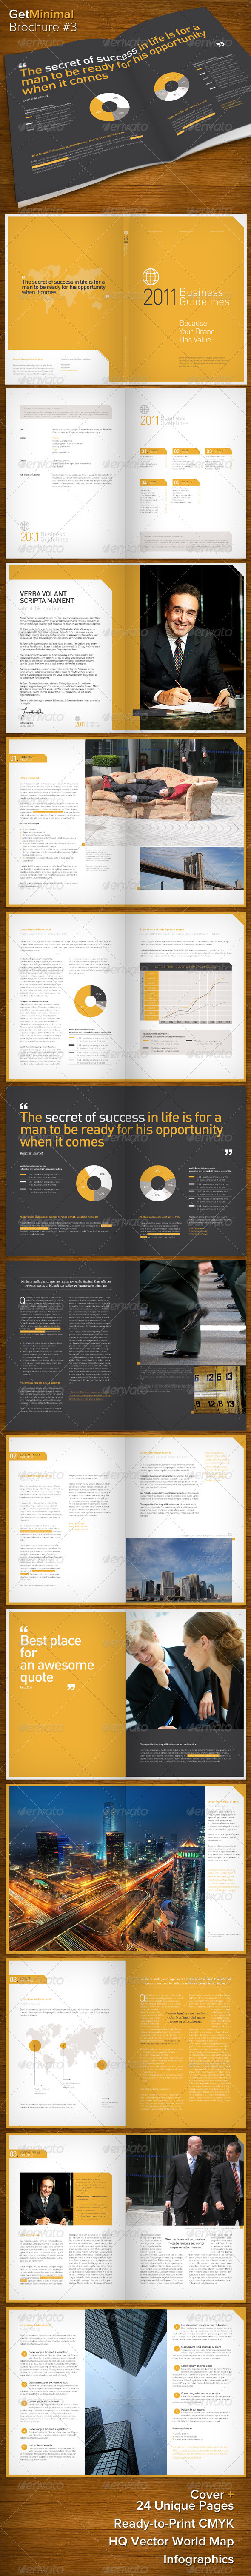 GraphicRiver Get Minimal Brochure 03 508452